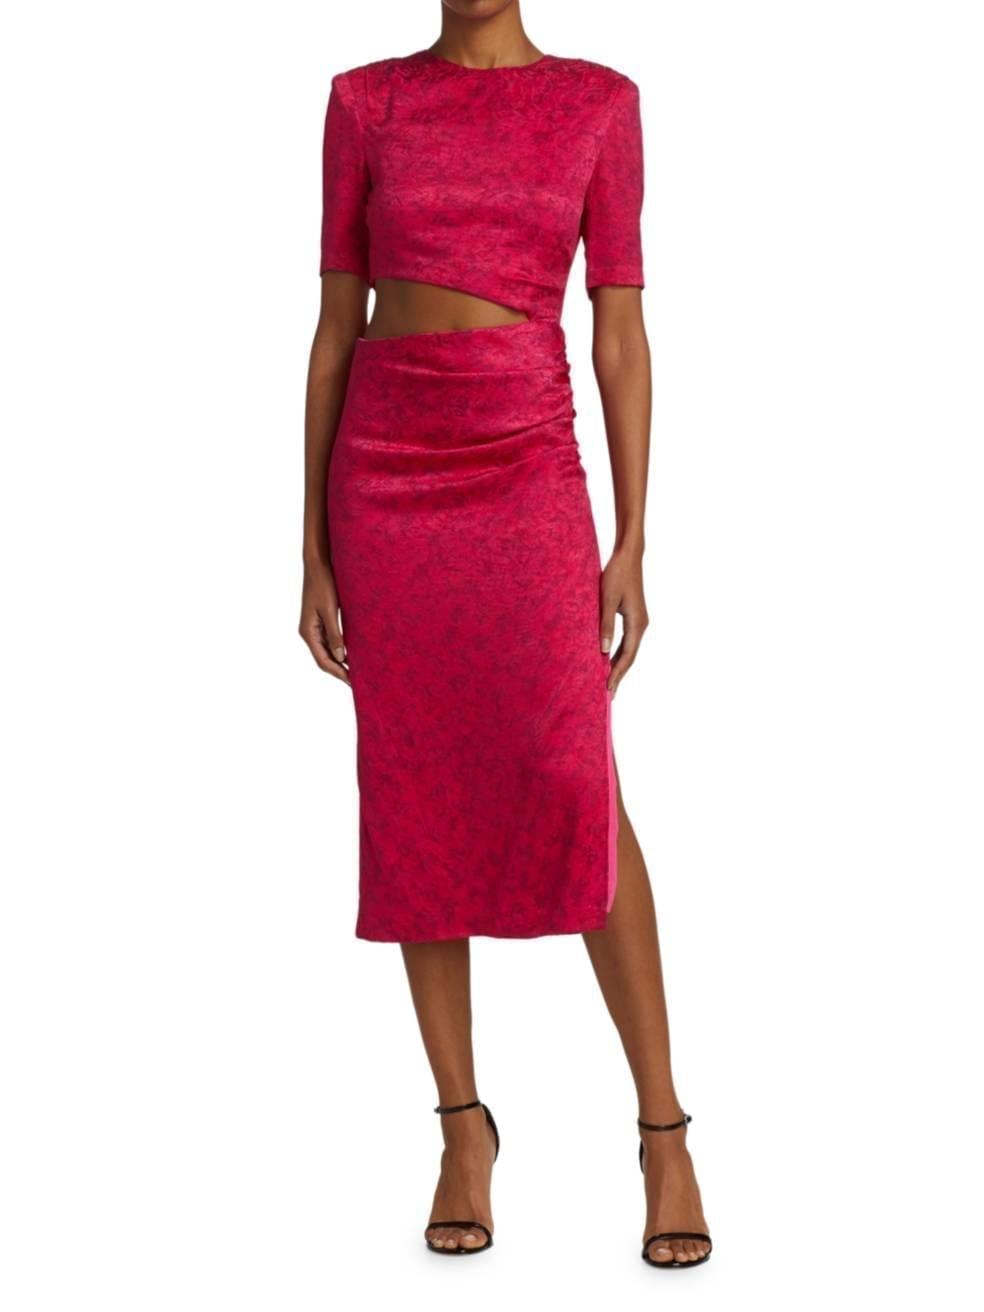 ALICE + OLIVIA Stella Floral Jacquard Side Cutout Sheath Dress